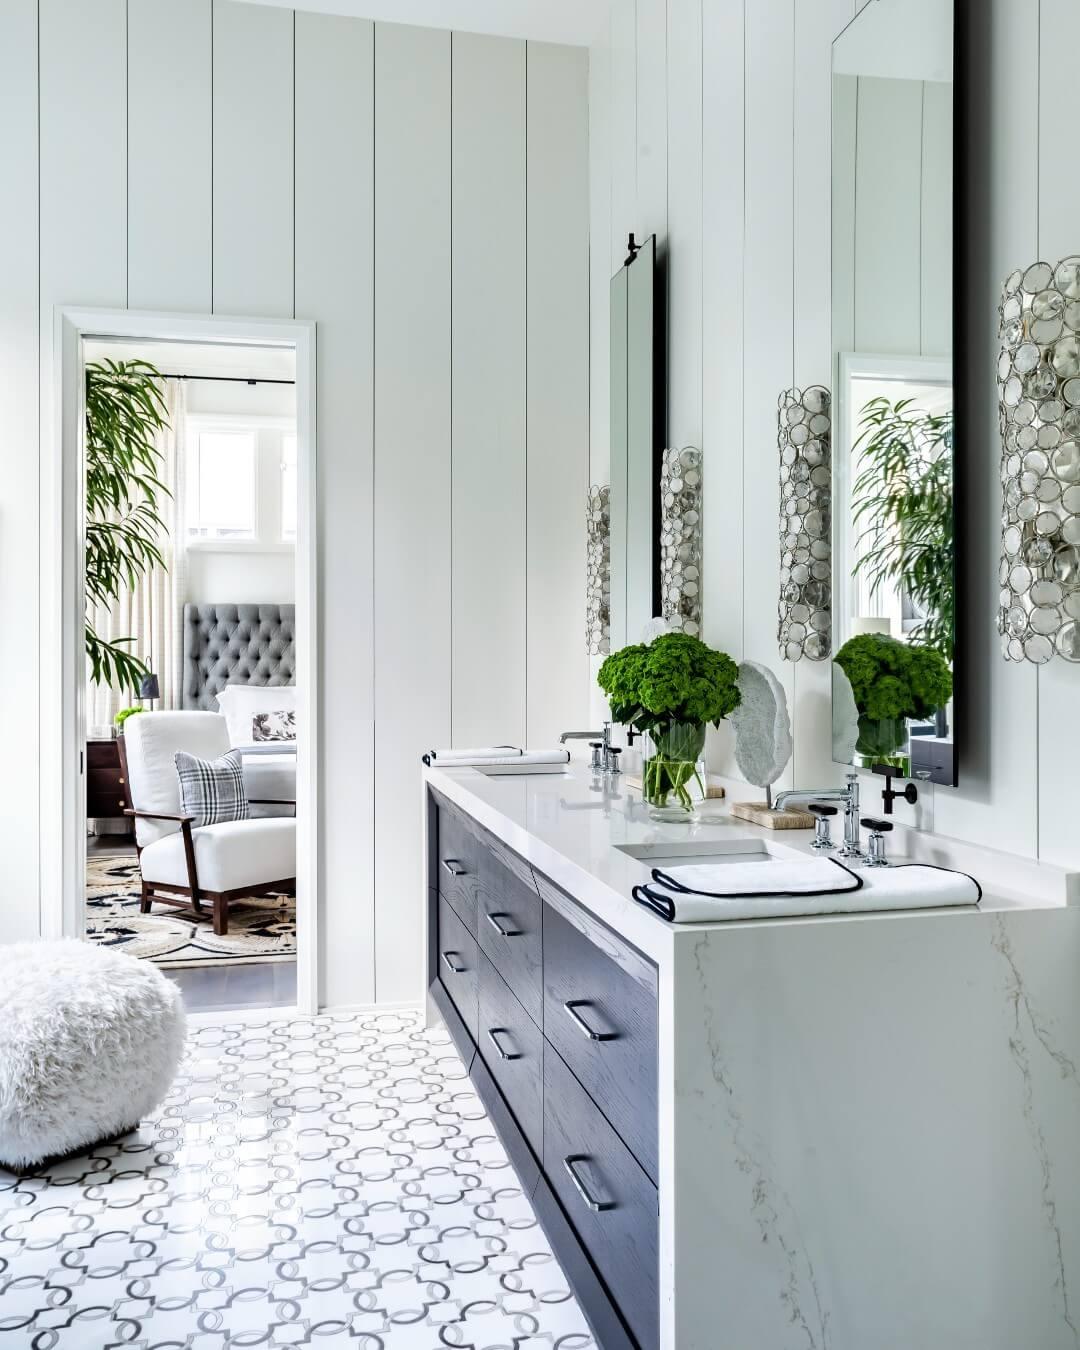 Granite vs Quartz for Bathroom Countertops